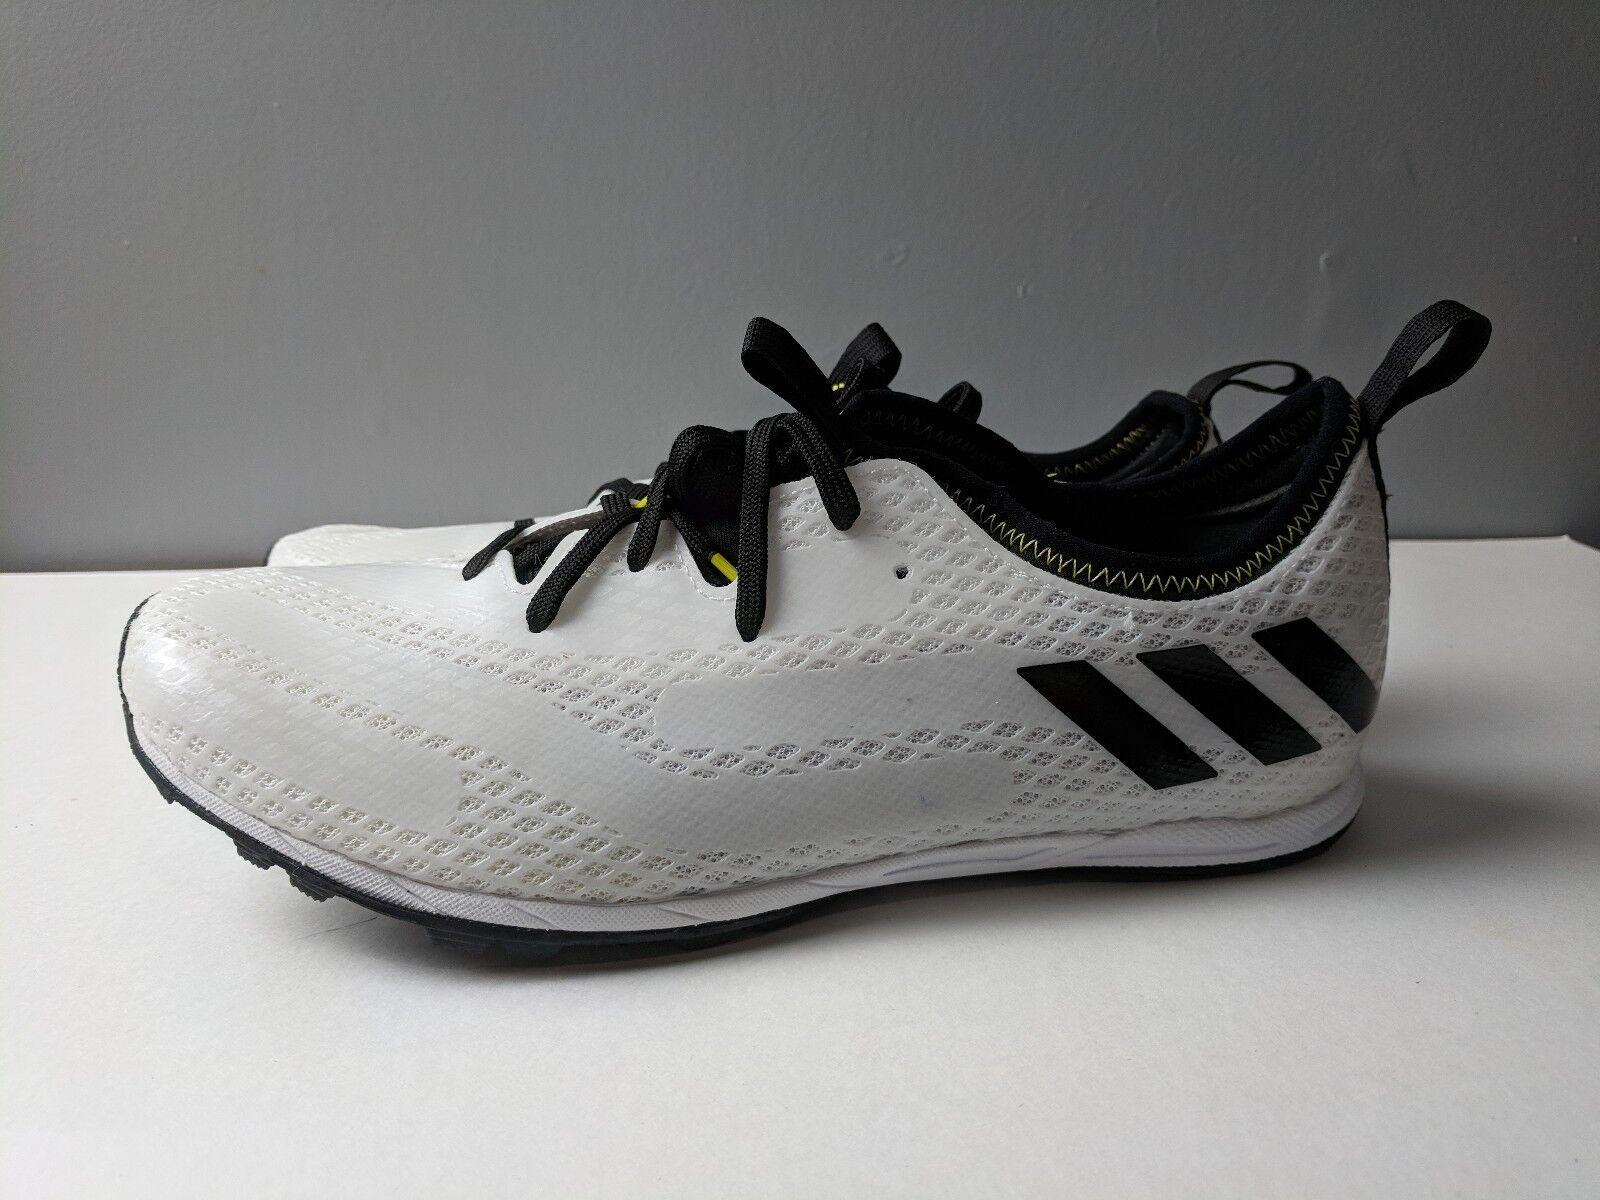 Brand New Adidas XCS Trainer Shoe Black White Womens Size 8.5 SPIKE